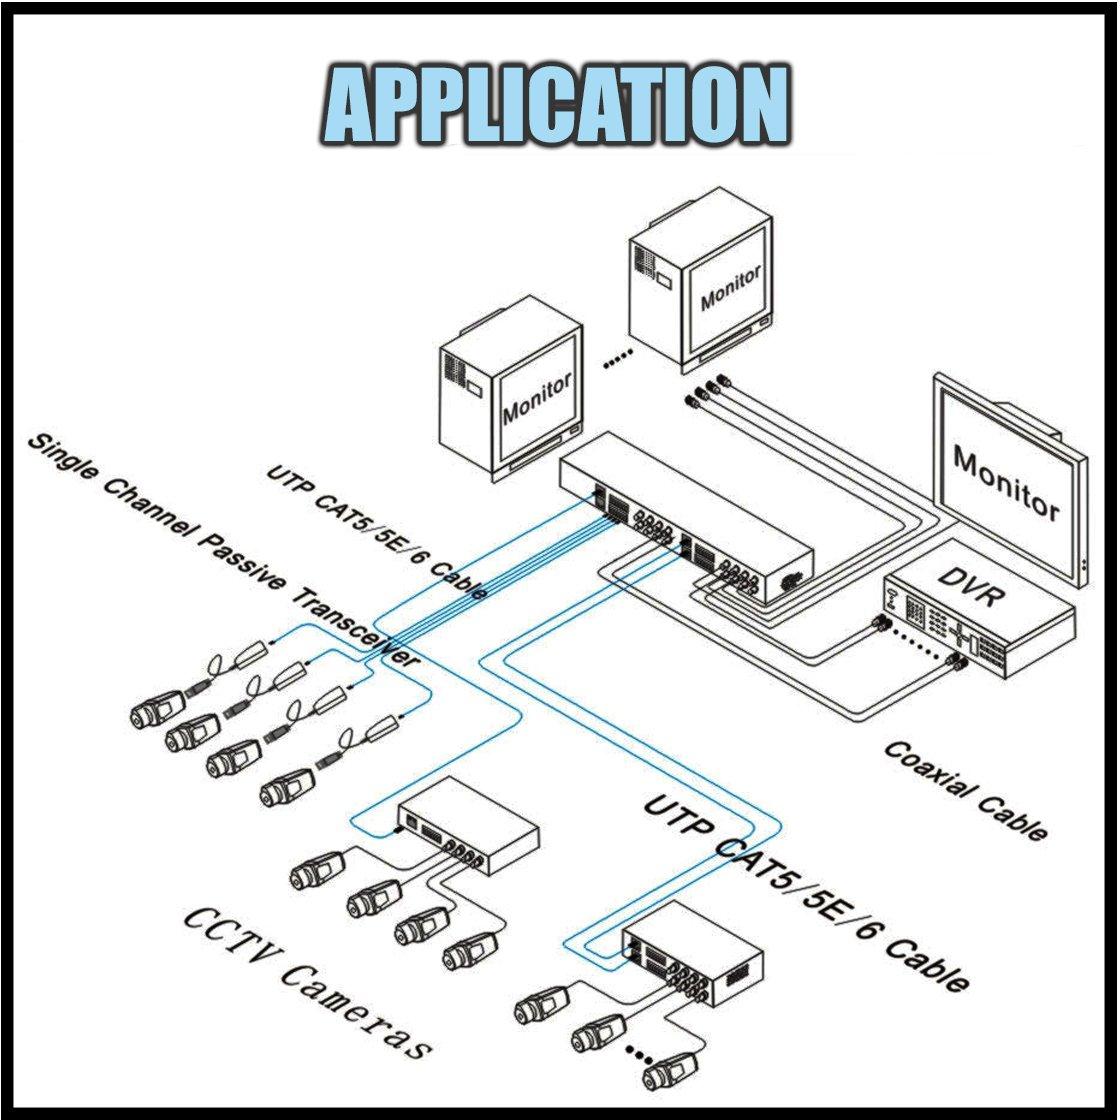 Ventech Cctv 16 Ch Video Balun Pasive Transceiver Block Diagram Of Rj45 Accessories Camera Photo